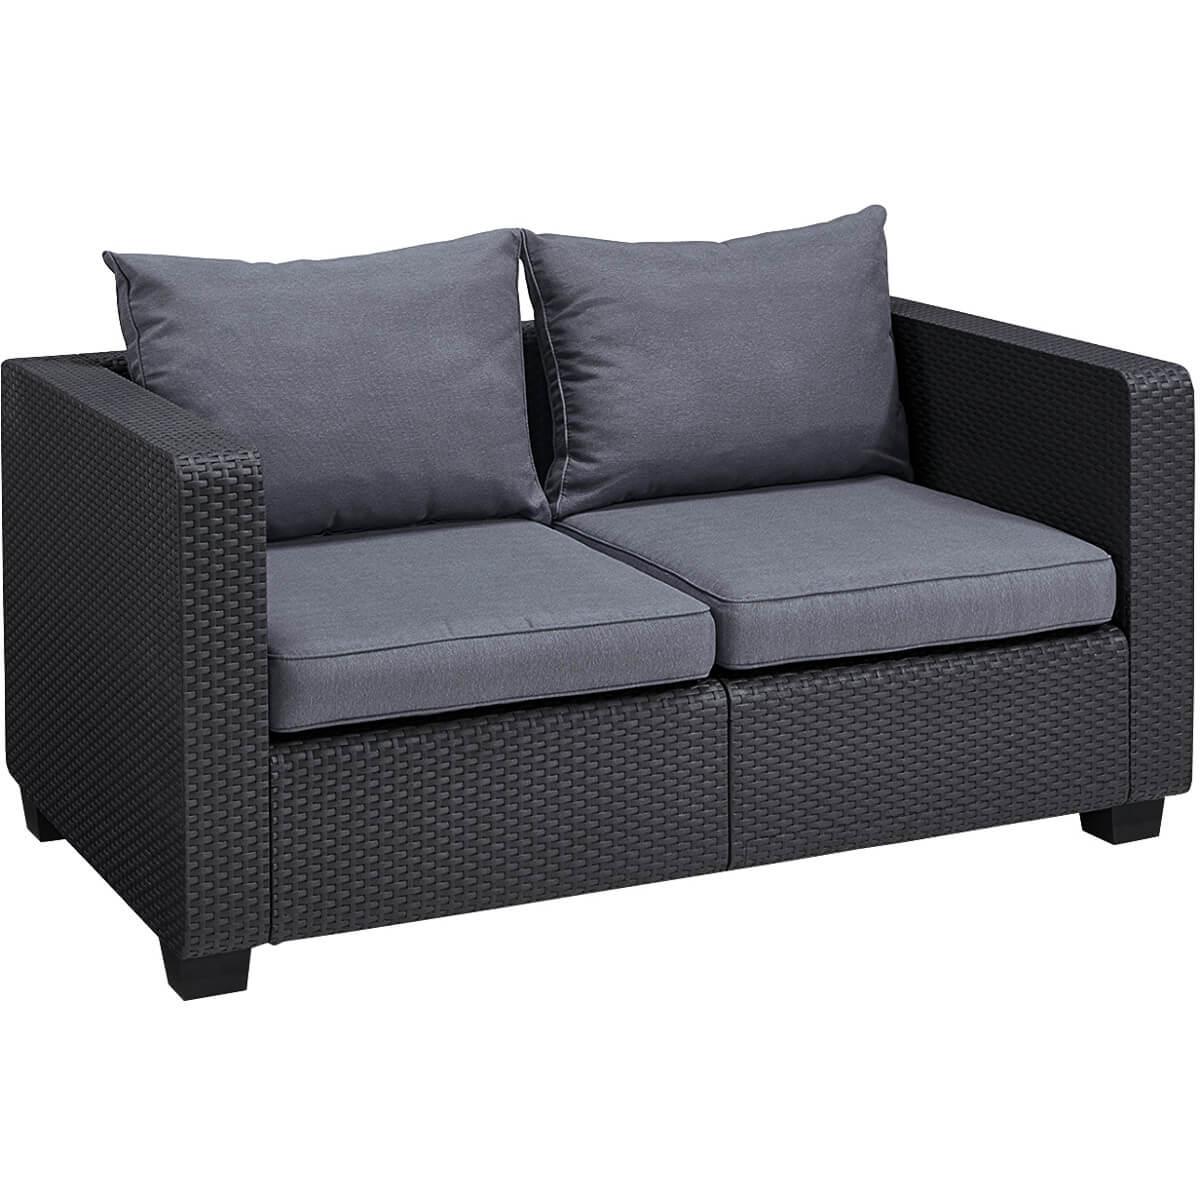 Диван Keter Salta 2 sofa